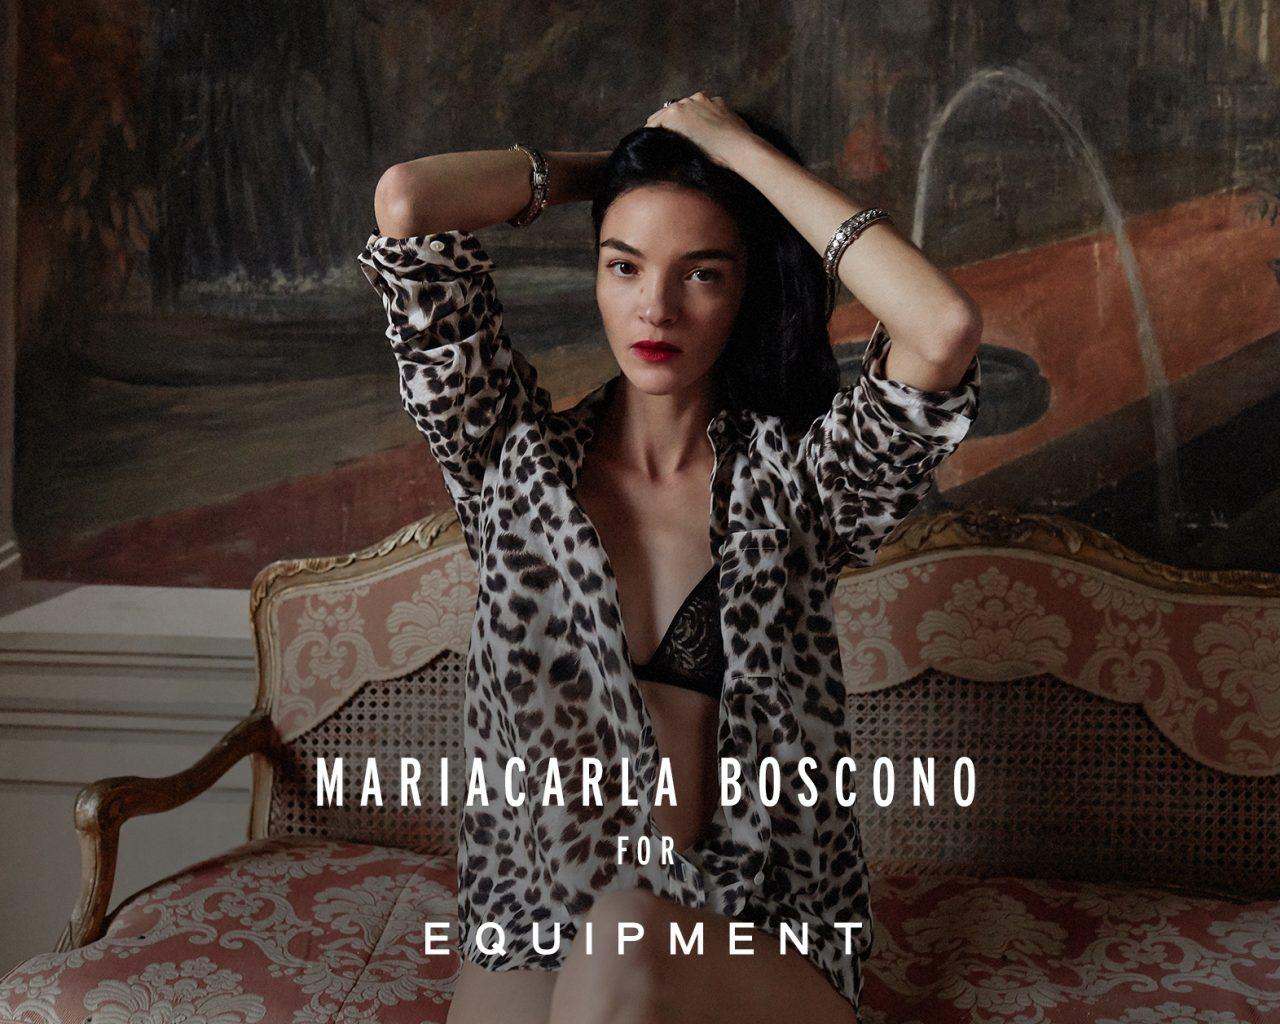 Mariacarla Boscono for Equipment